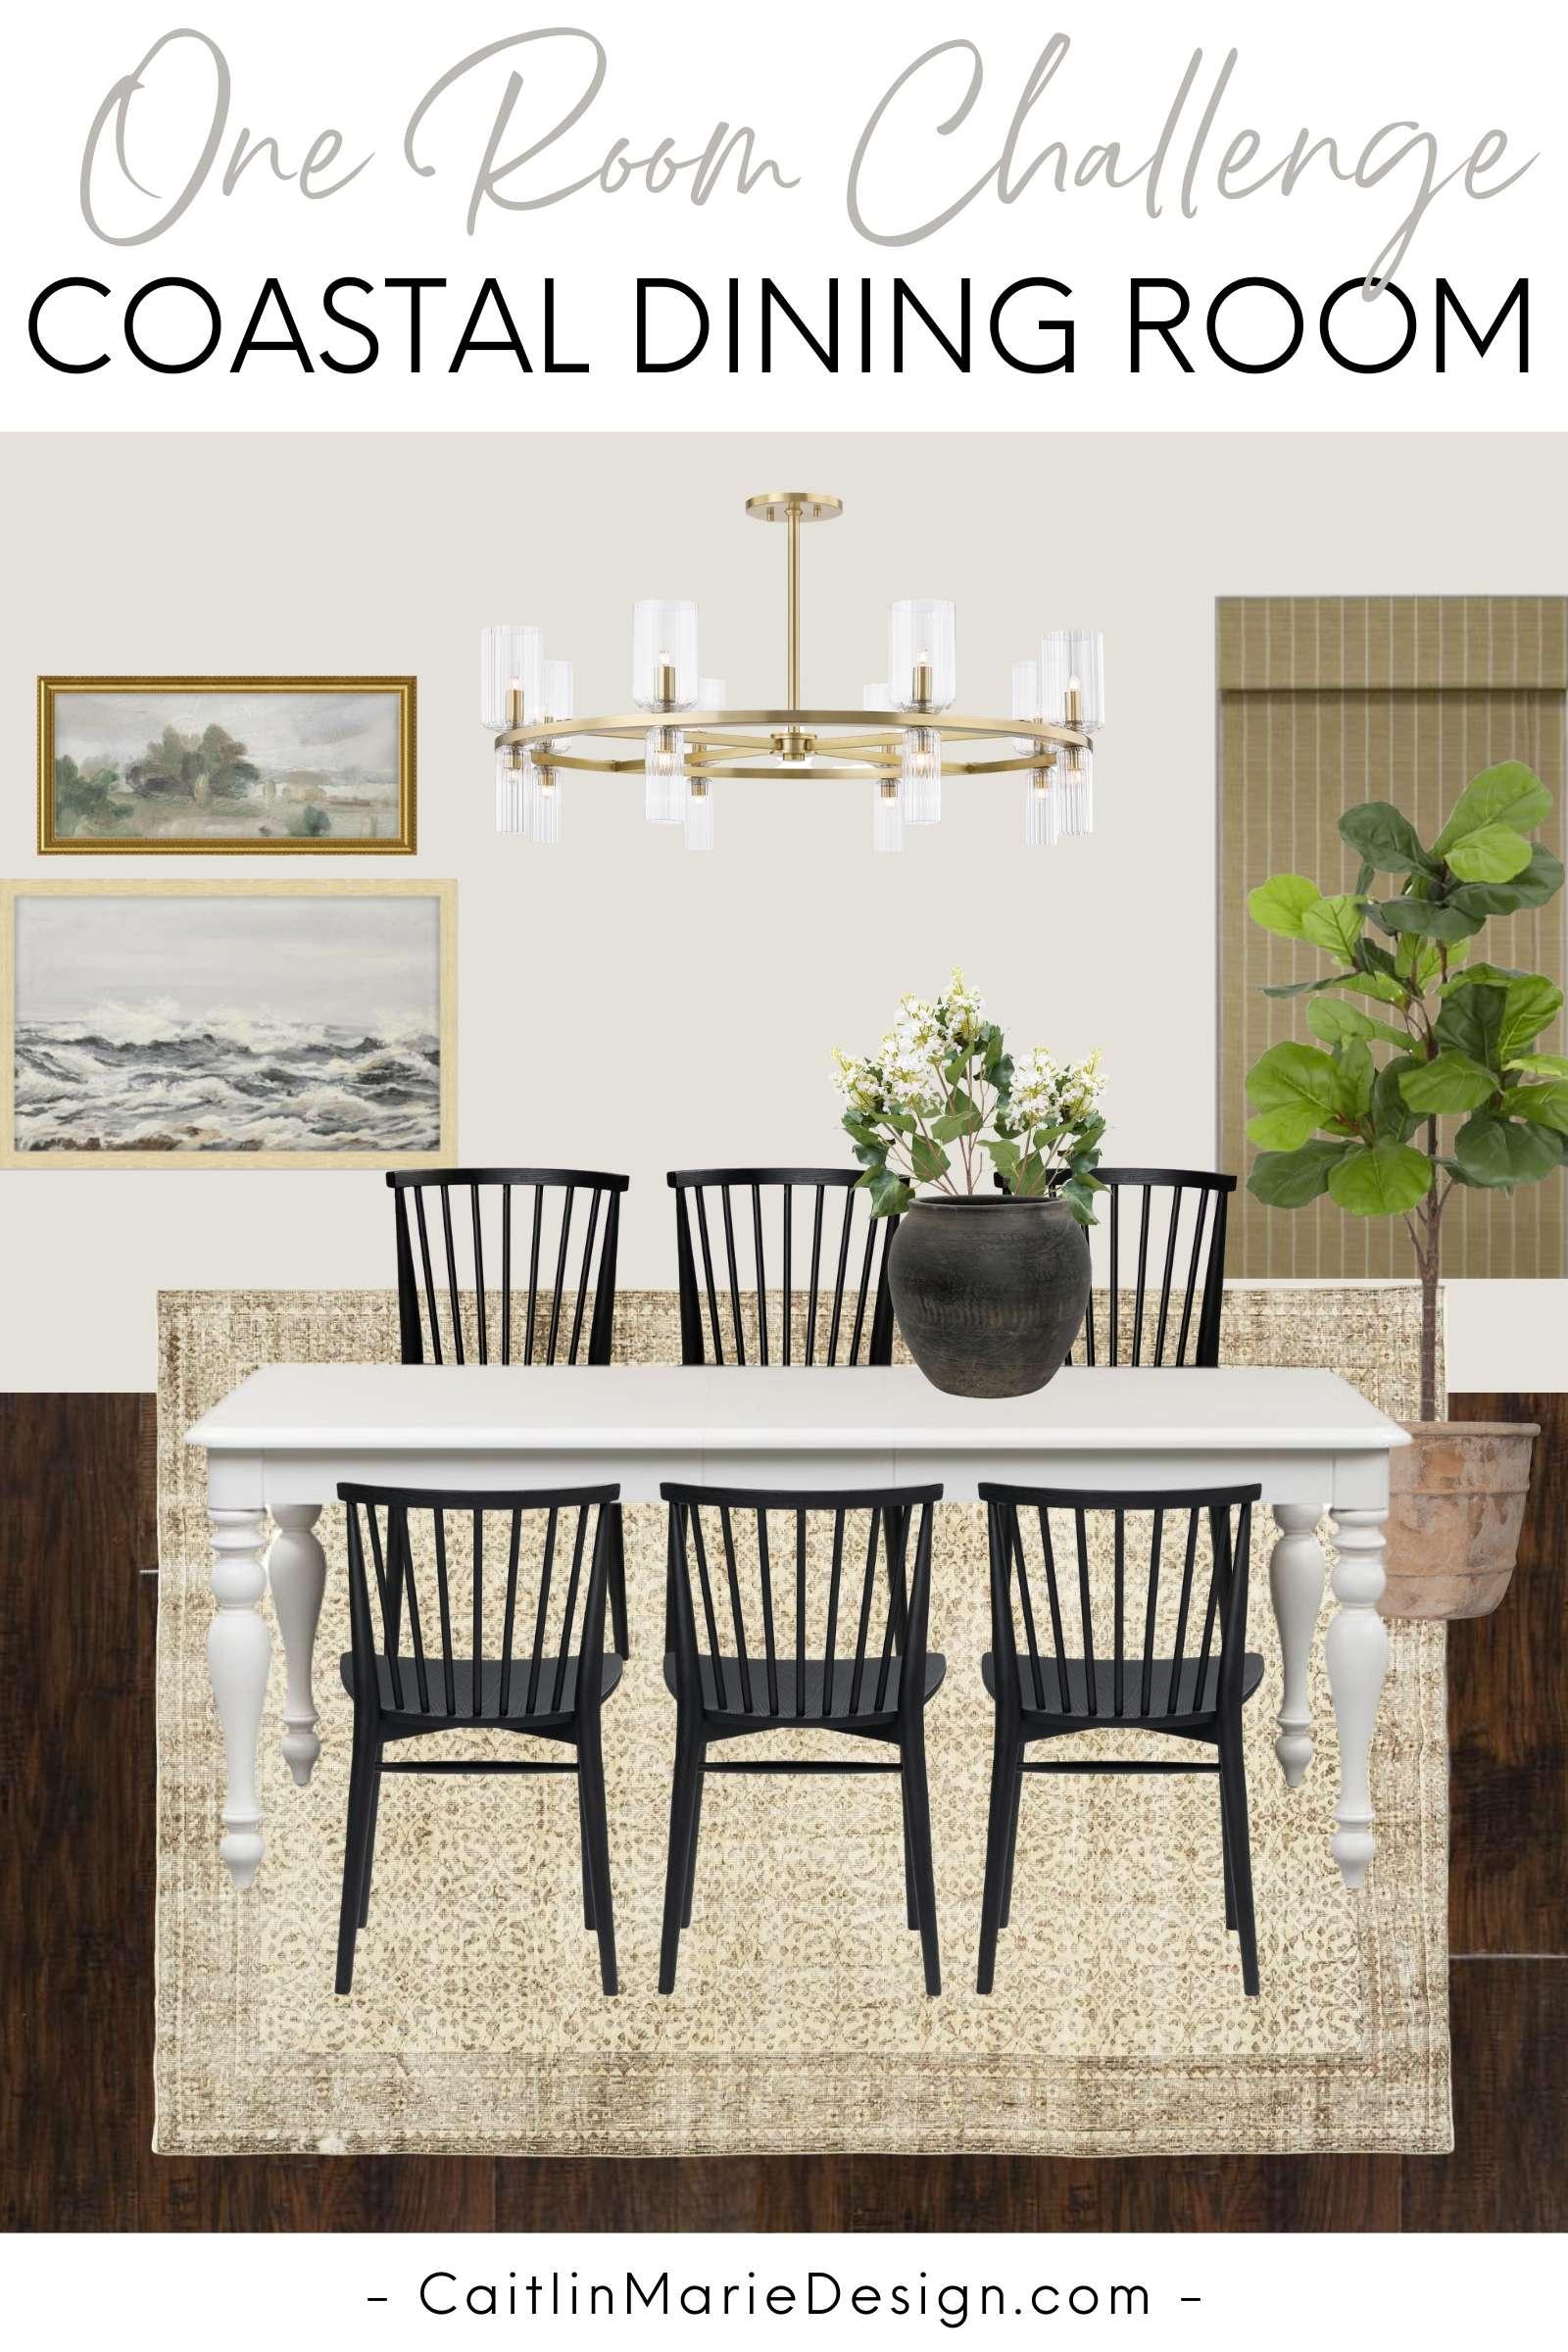 Coastal Dining Room Mood Board | One Room Challenge Spring 2020, white farmhouse table, black Windsor dining chairs, brown vintage rug, brass modern chandelier, coastal landscape artwork, budget decor, coastal decor